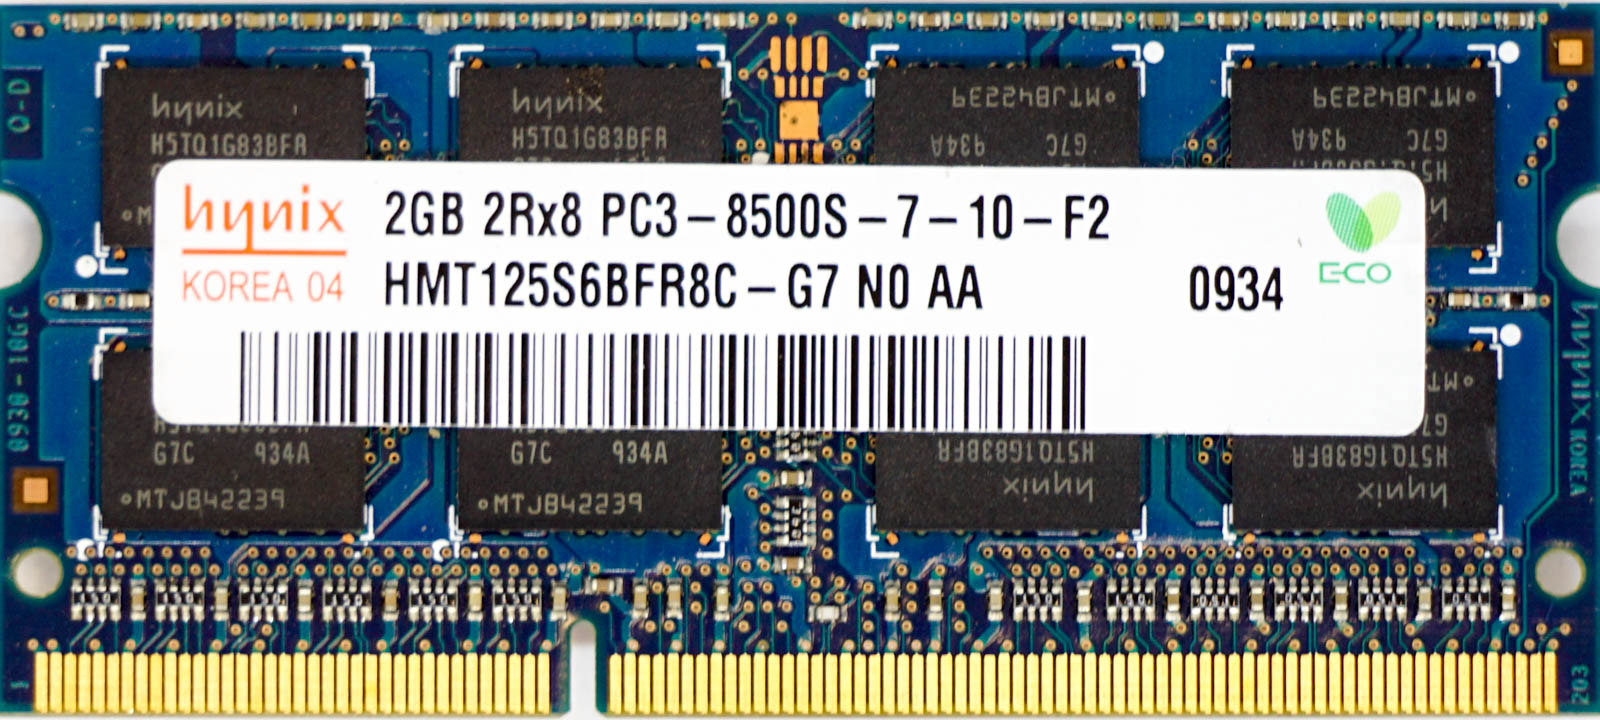 Hynix 2GB DDR3 1066MHz PC3-8500 Desktop Memory HMT125U6BFR8C-G7